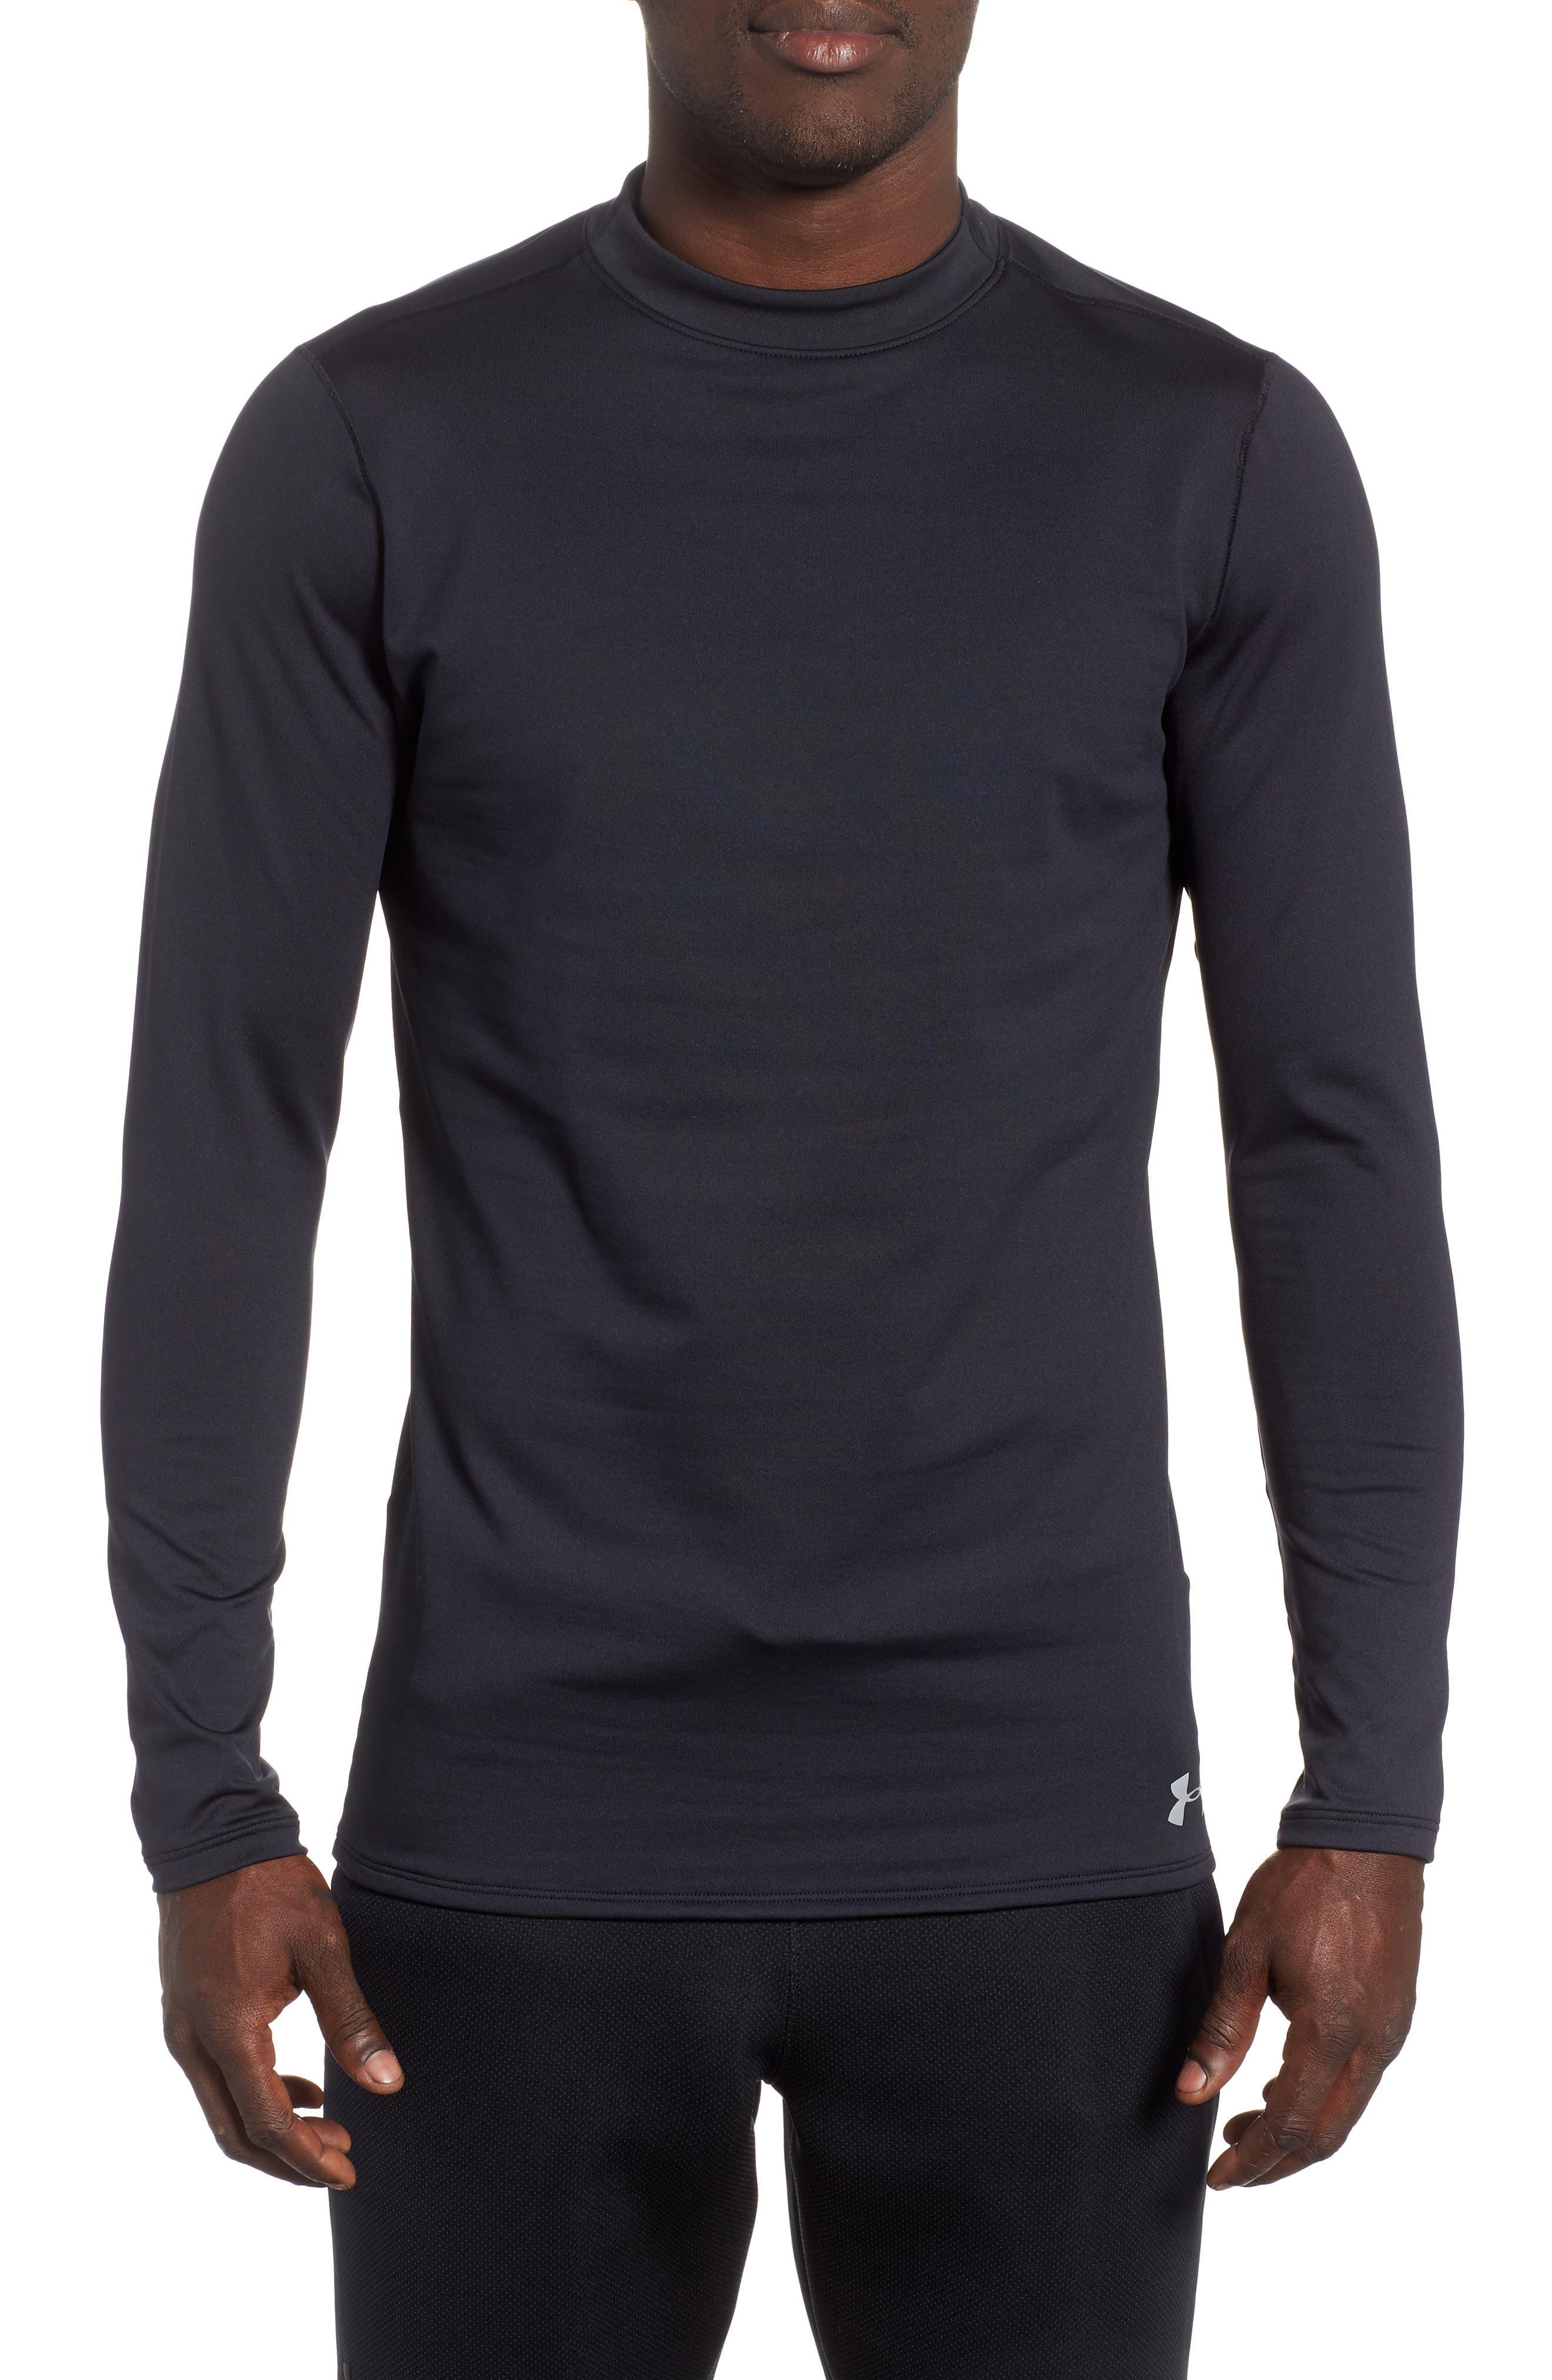 ColdGear<sup>®</sup> Mock Neck Long Sleeve T-Shirt,                             Main thumbnail 1, color,                             BLACK/ STEEL